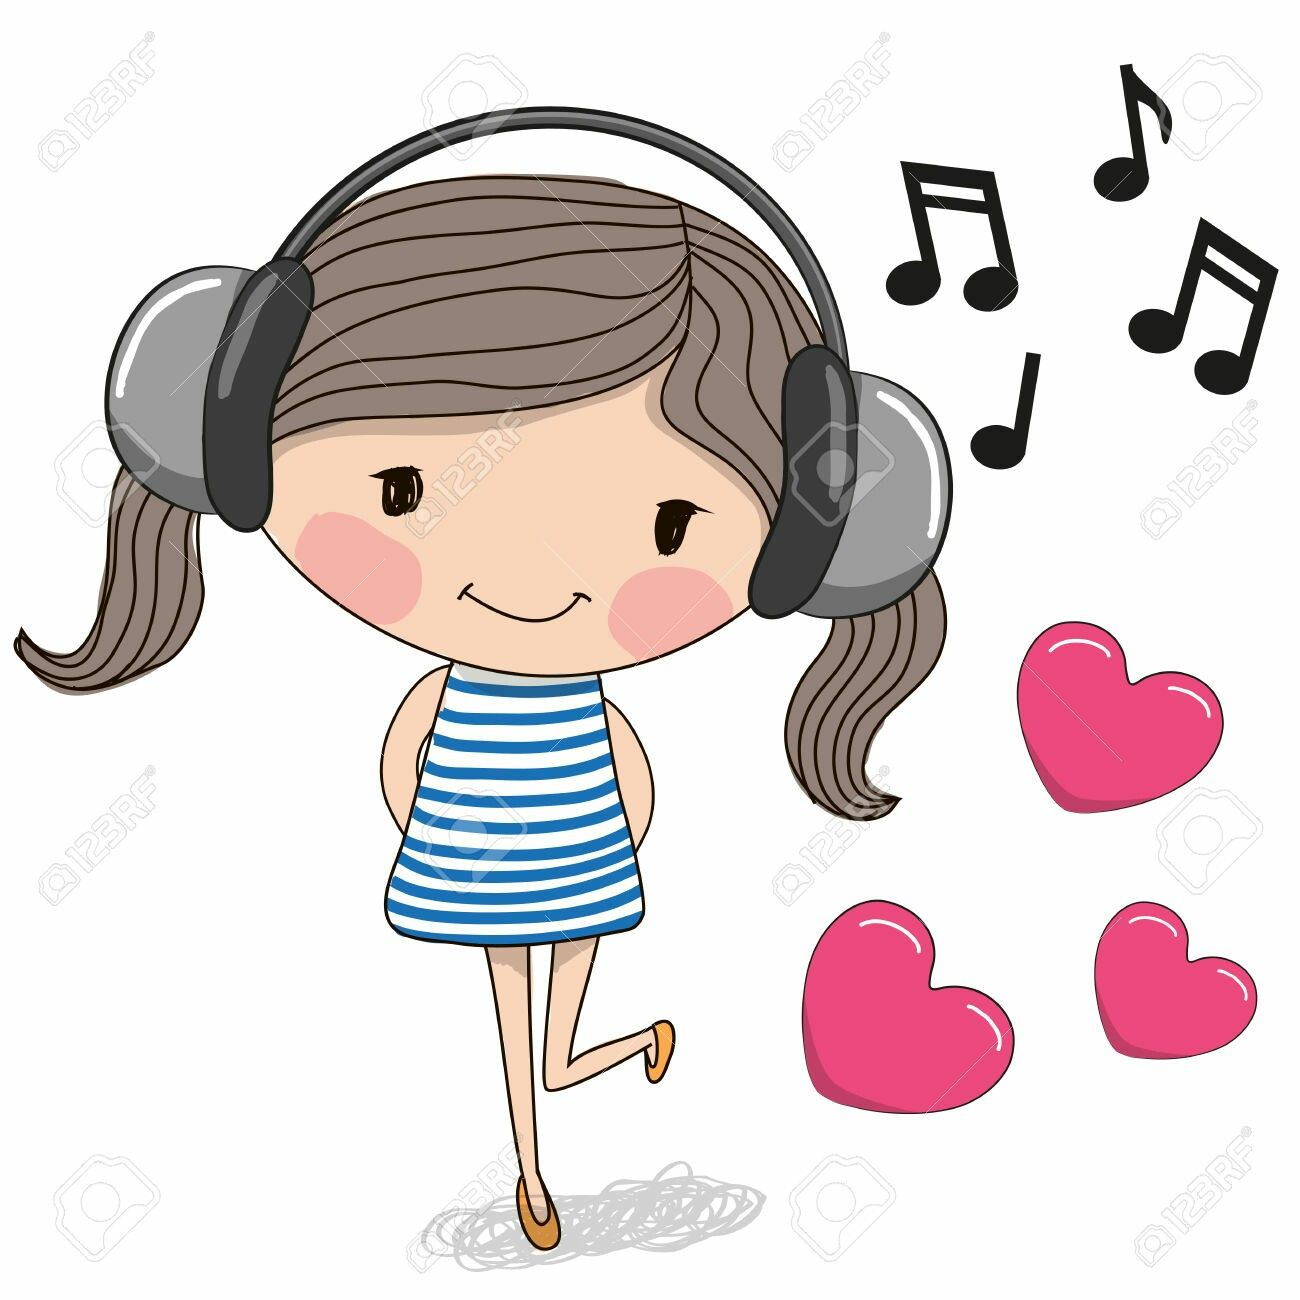 Pin By Adriana Cerretani On Digis Cute Cartoon Girl Girl With Headphones Cute Cartoon